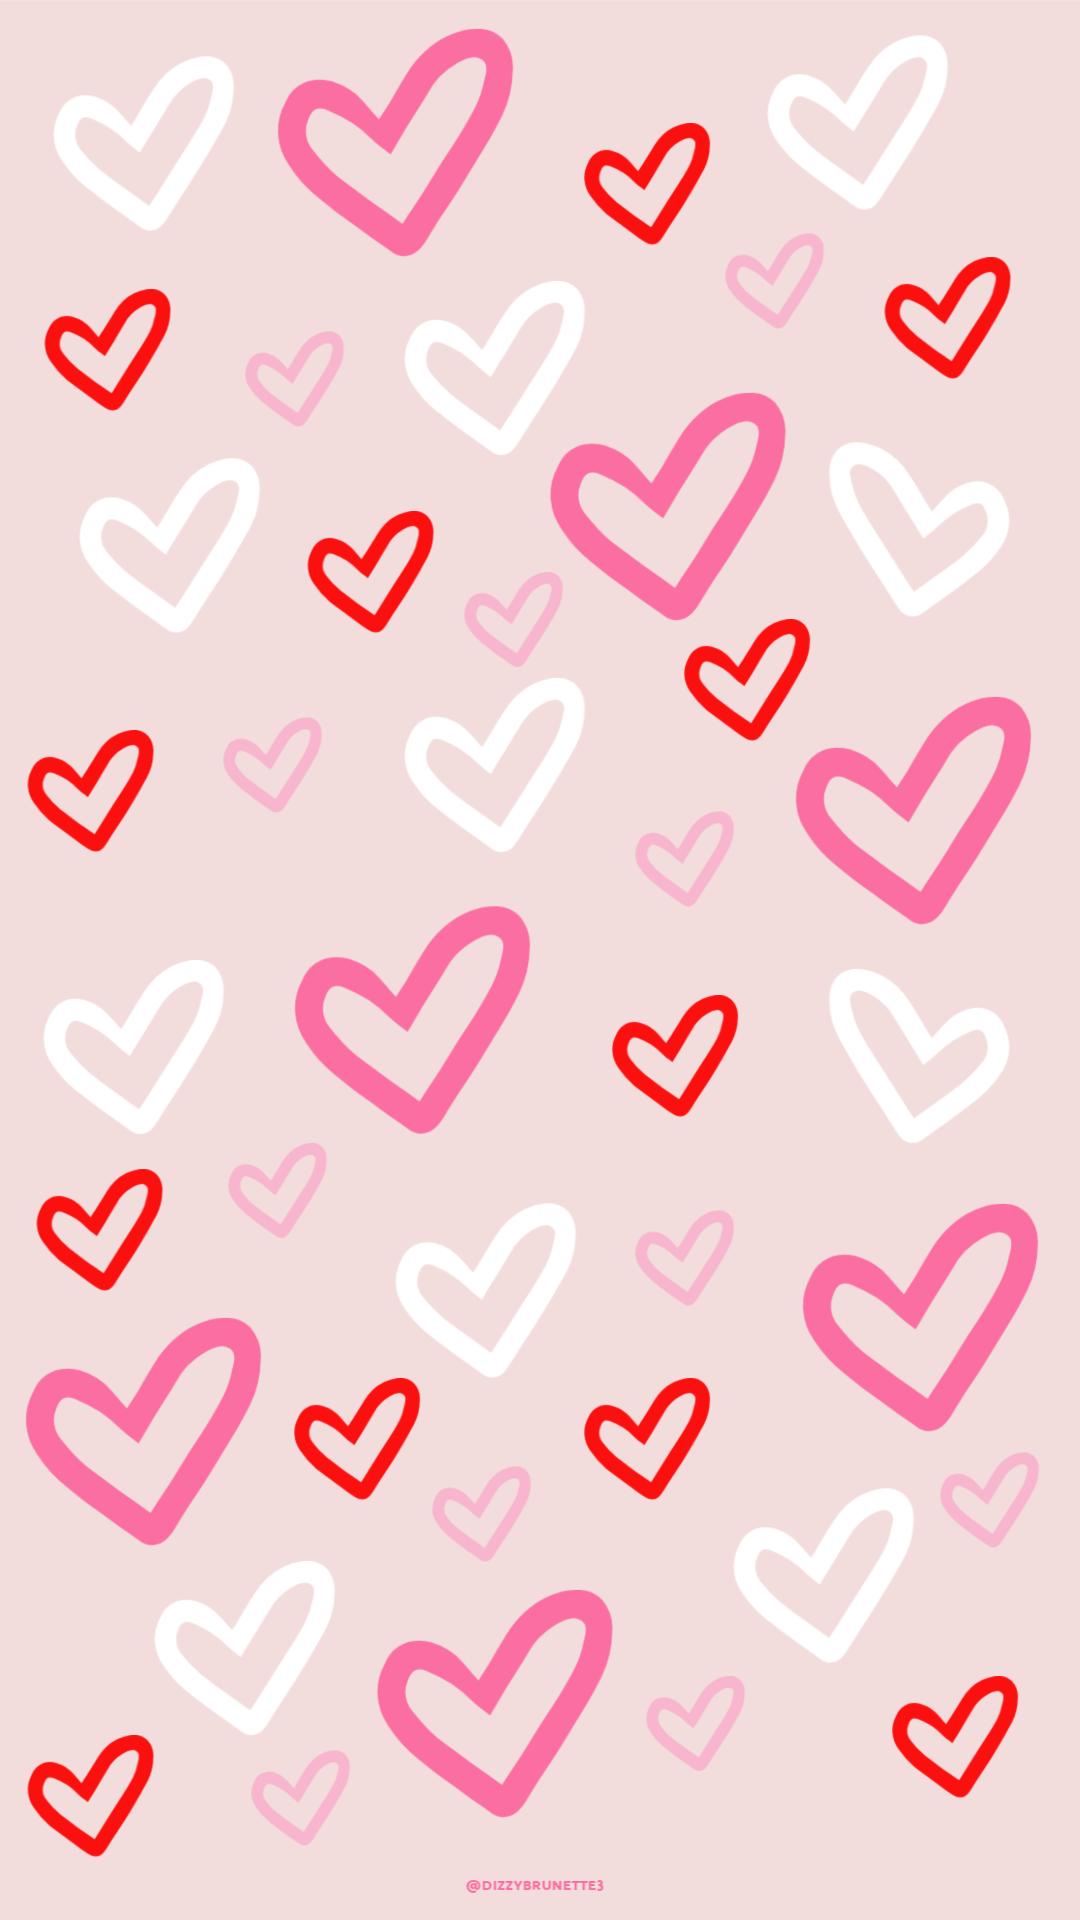 iPhone Wallpapers : Free Phone Wallpapers - Februa